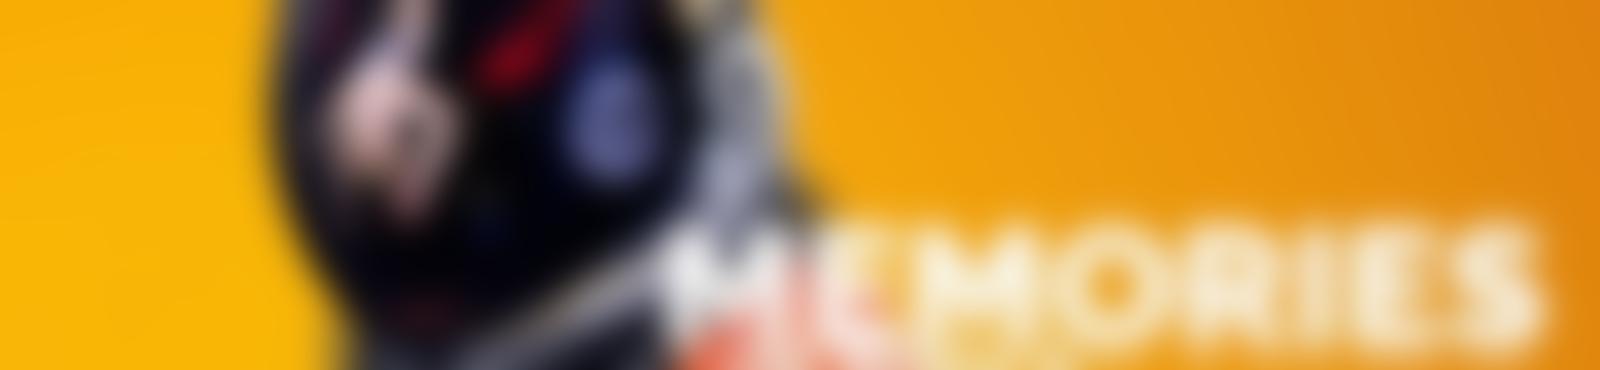 Blurred 30072b86 fdde 4ec2 a621 cf36d06ad0f4